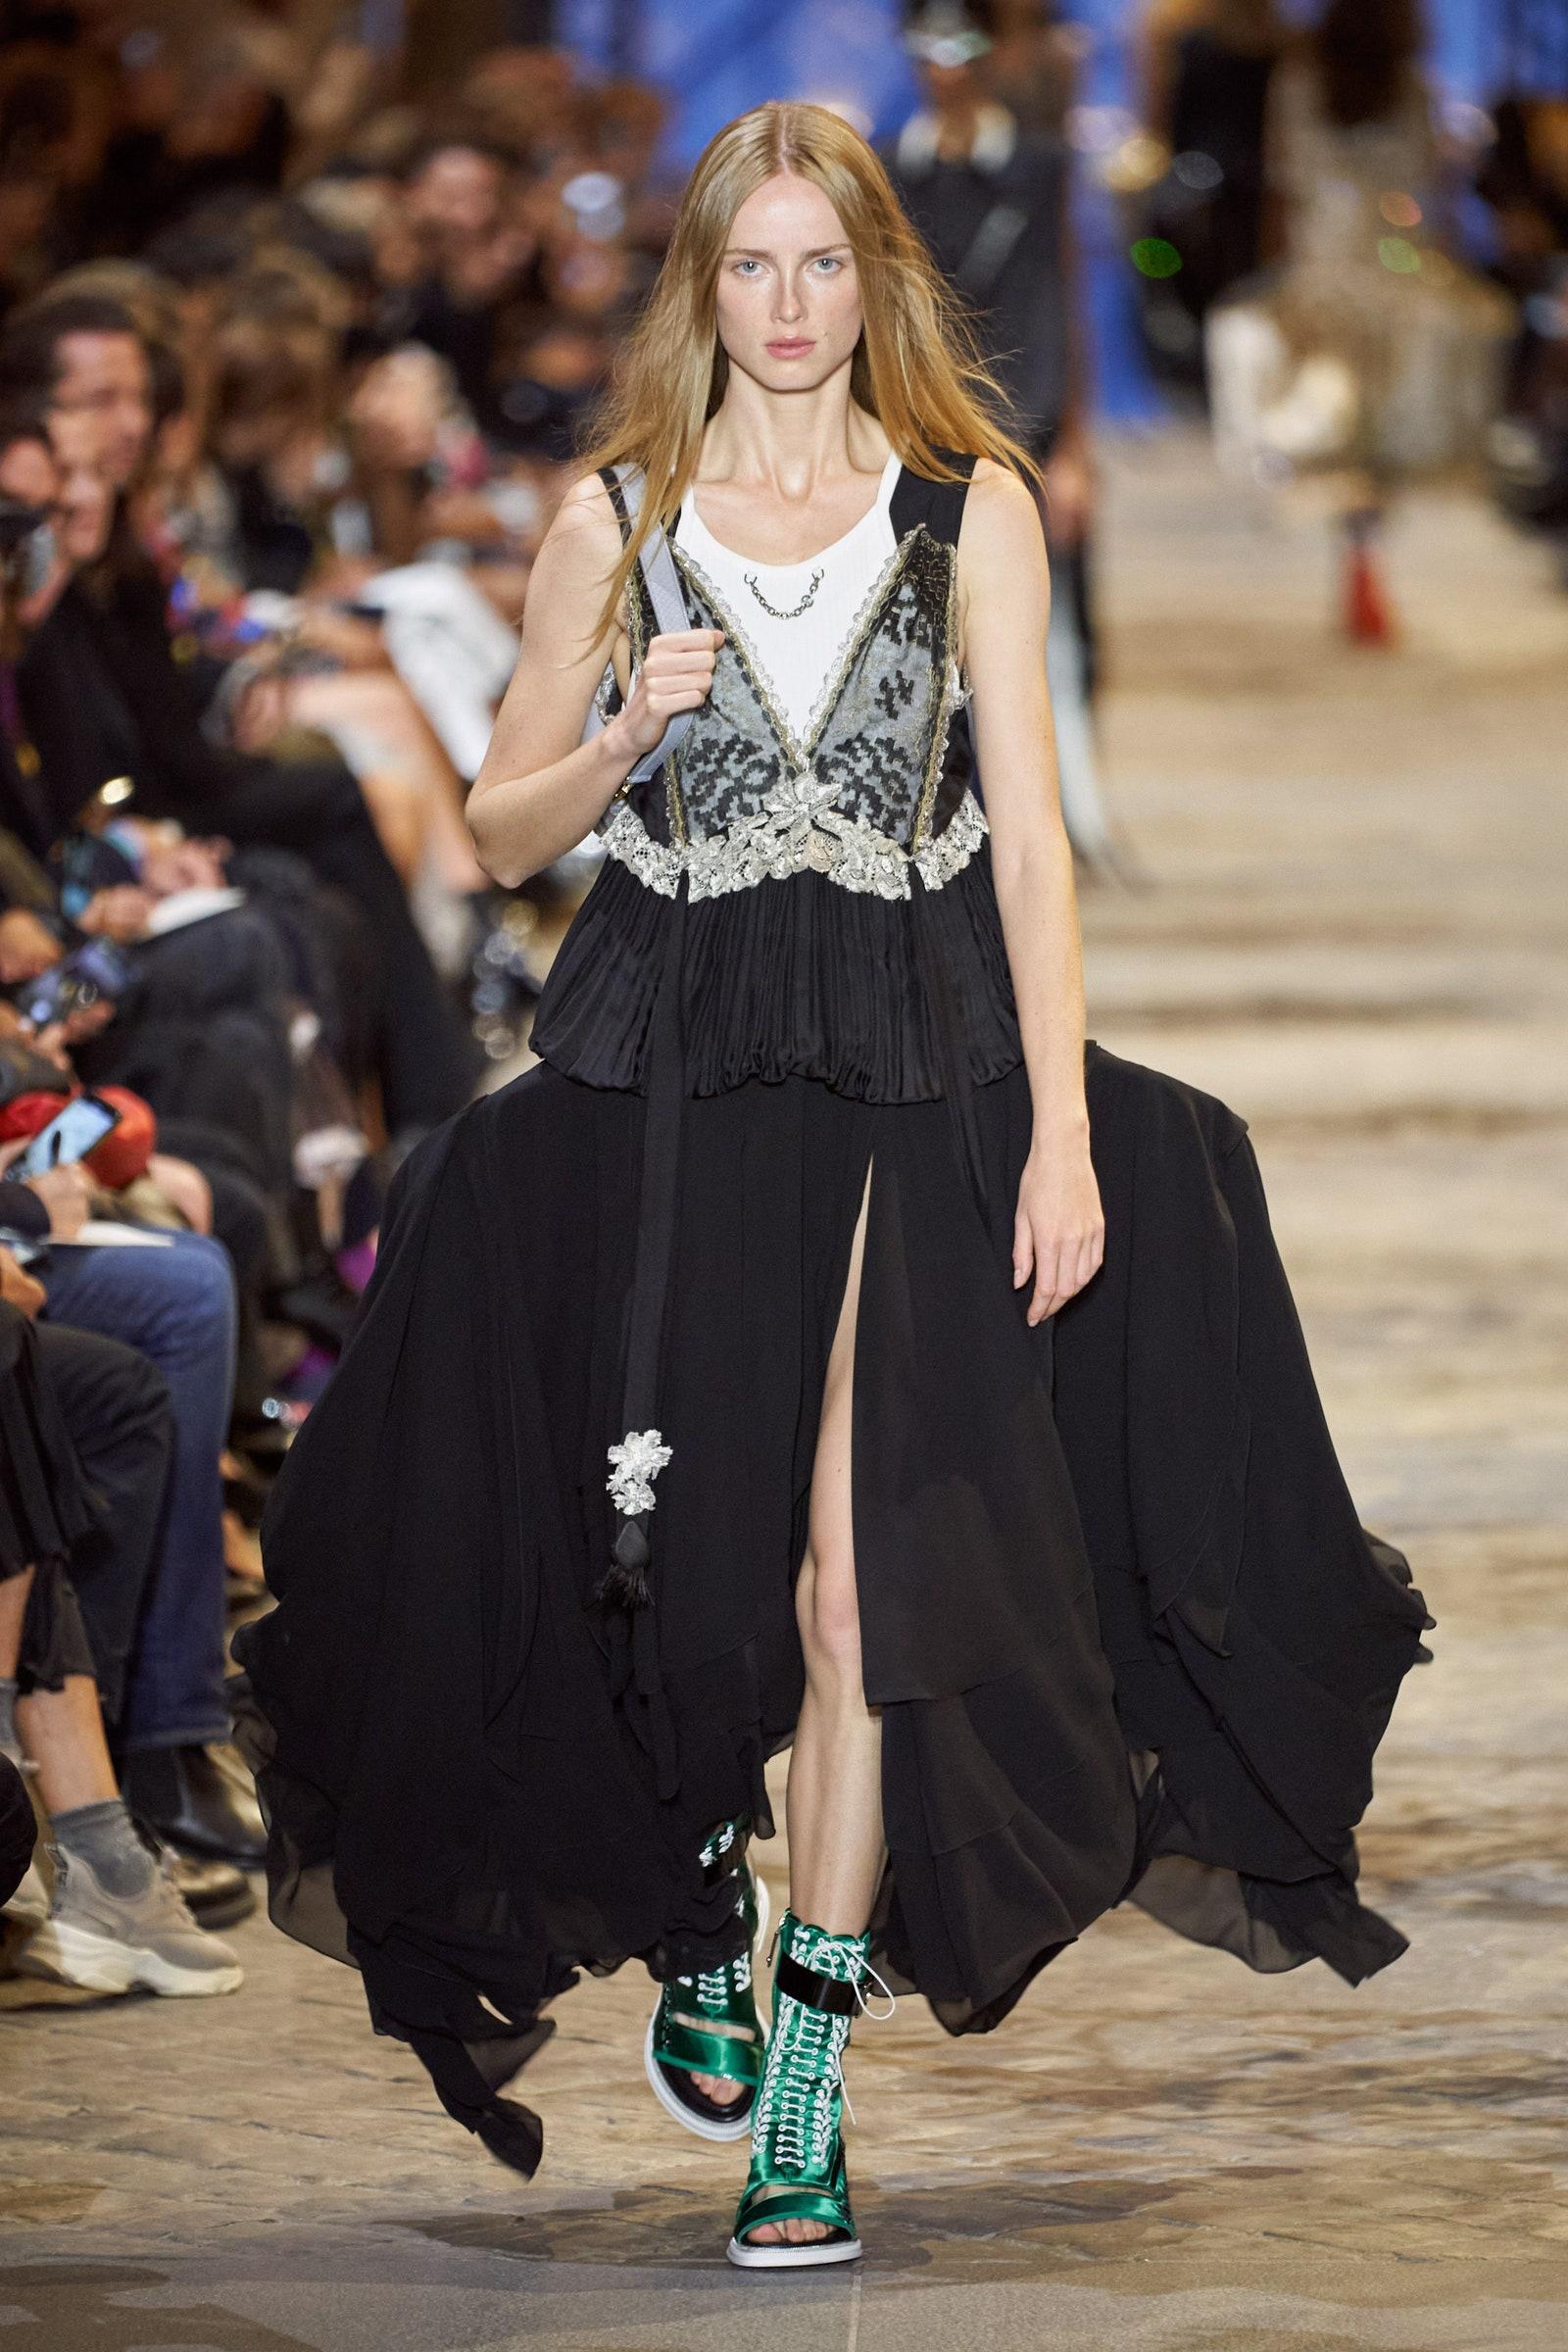 Louis Vuitton Spring 2022 Fashion Show